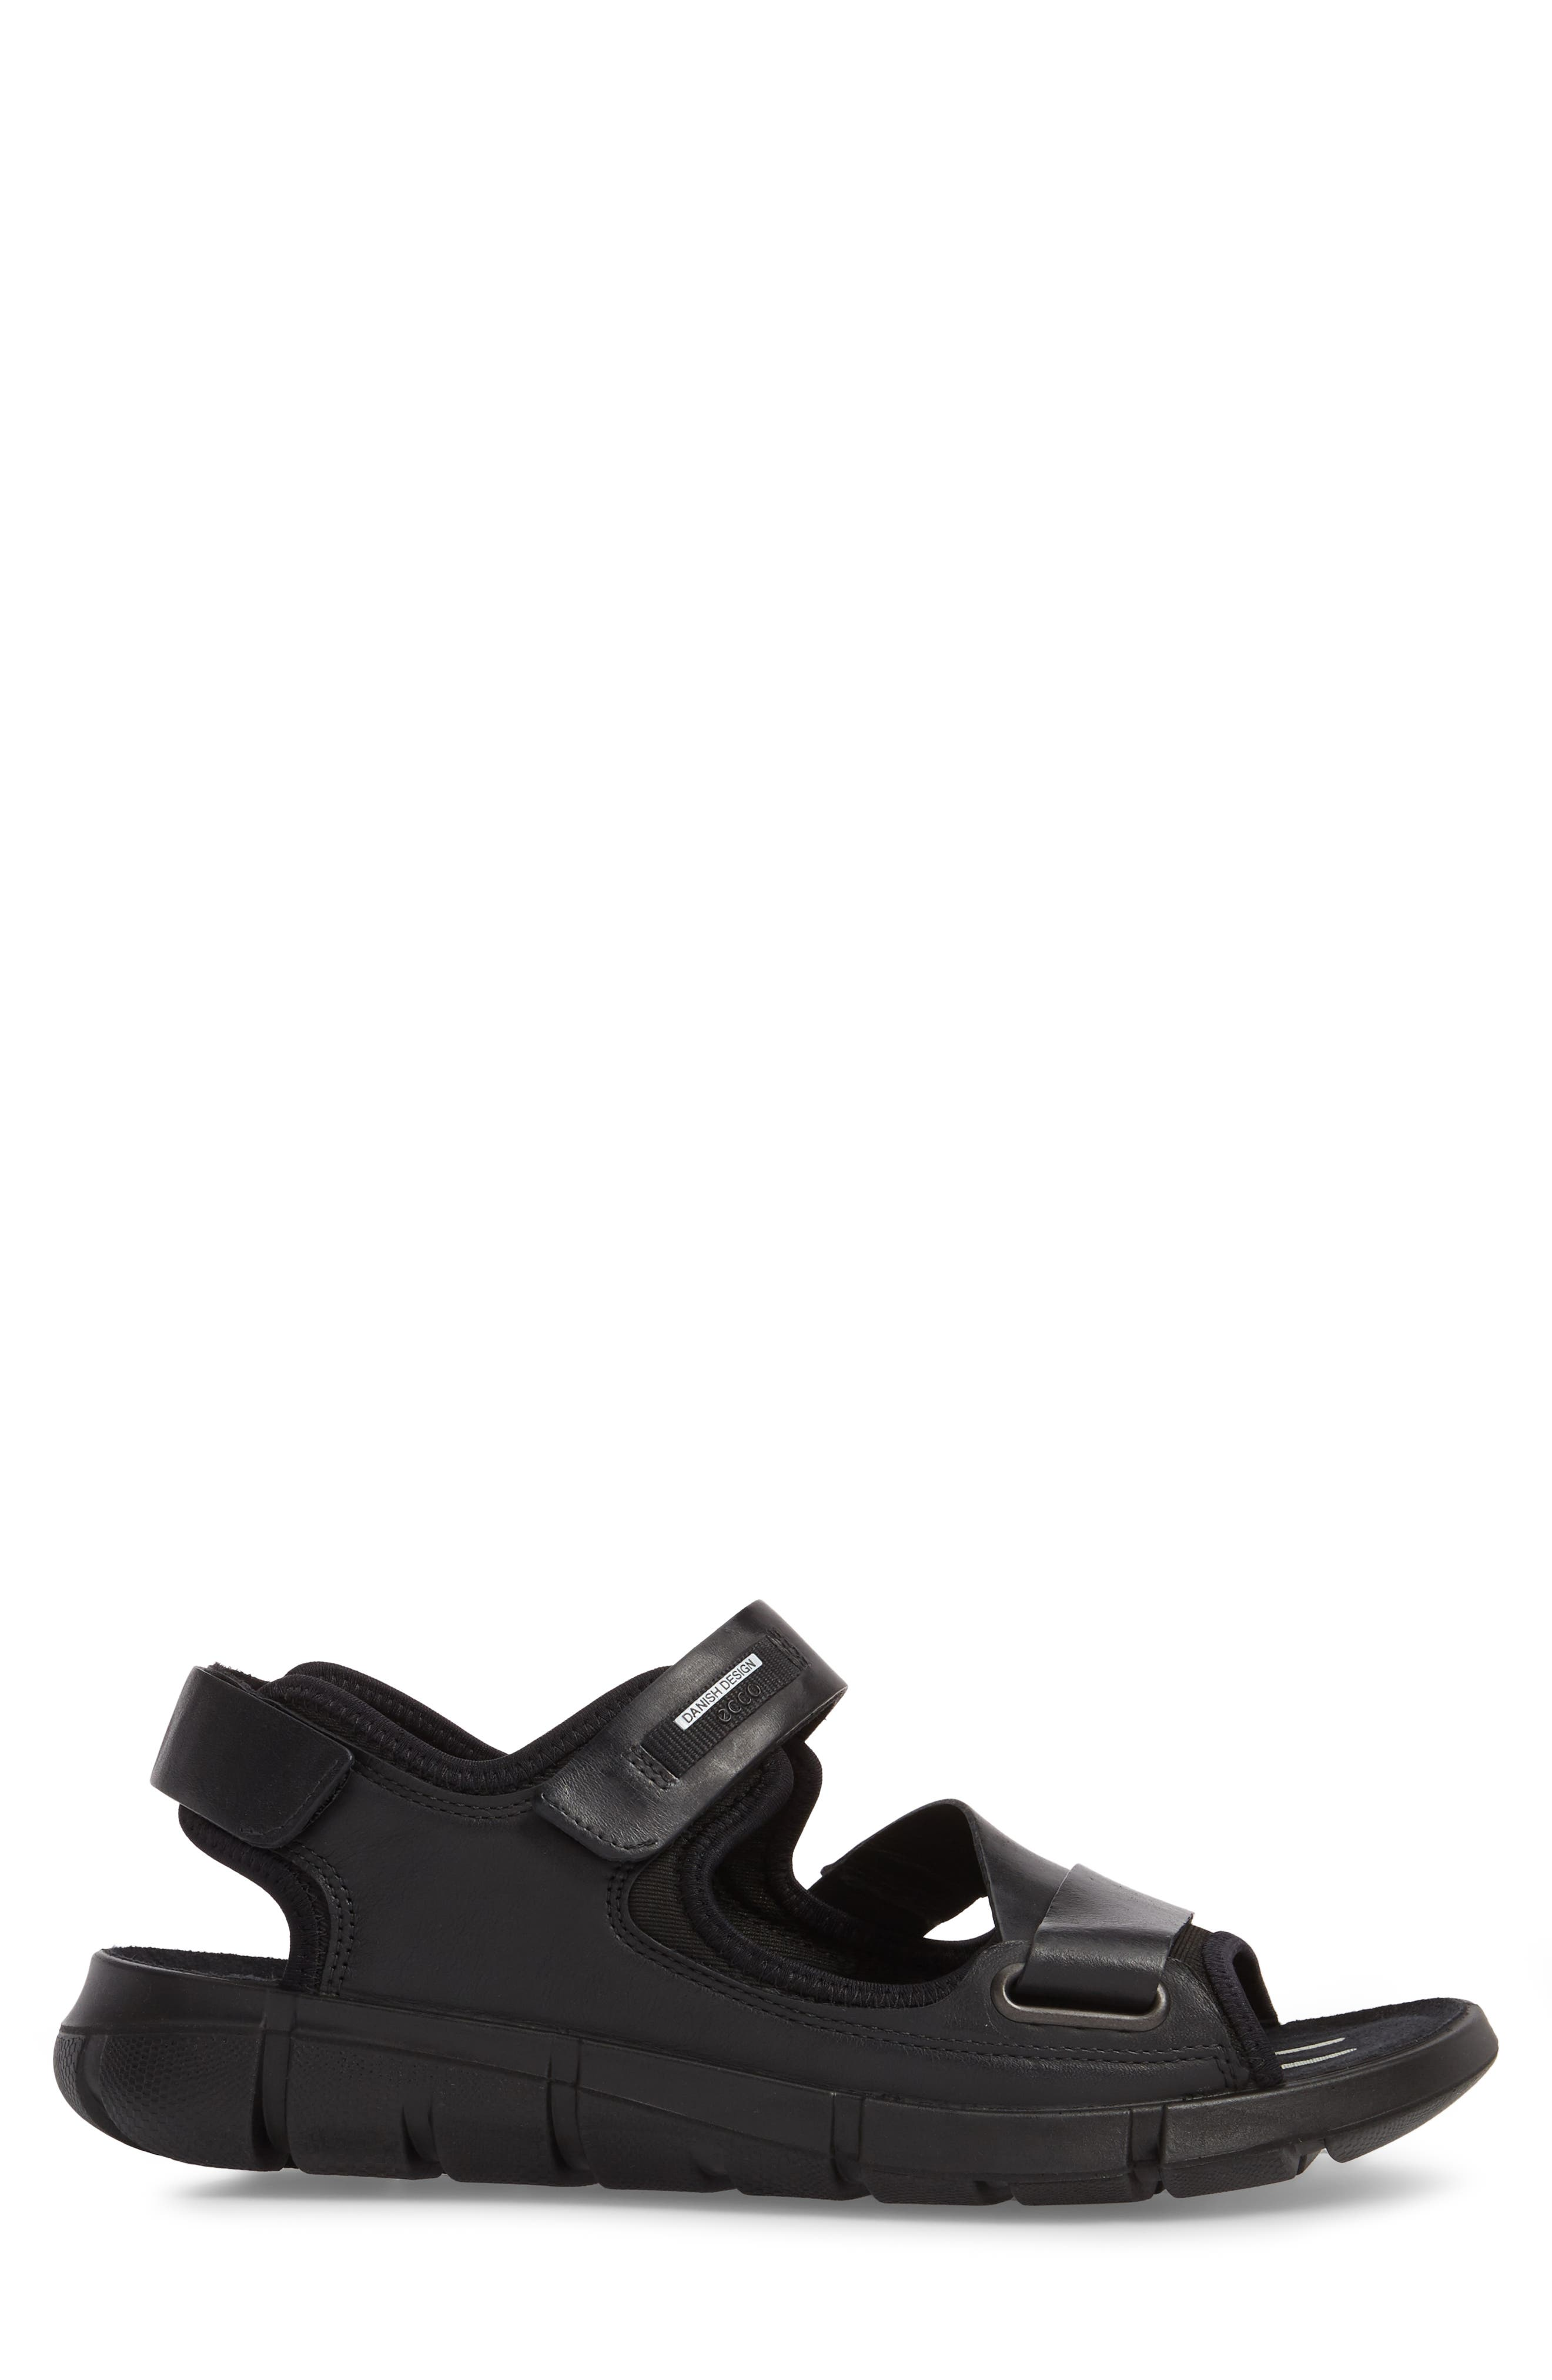 Intrinsic 2 Sandal,                             Alternate thumbnail 3, color,                             Black Leather